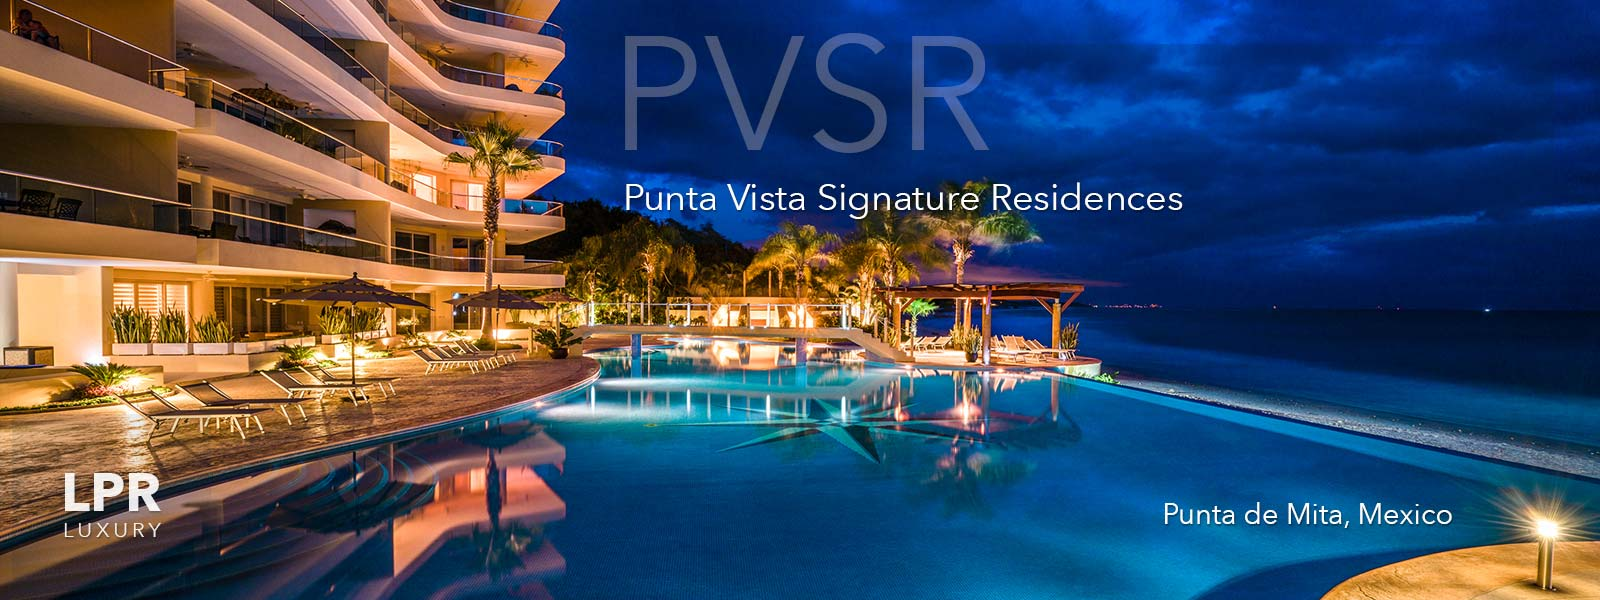 PVSR - Punta Vista Signature Residences - Playa Punta Mita, Riviera Nayarit, Mexico